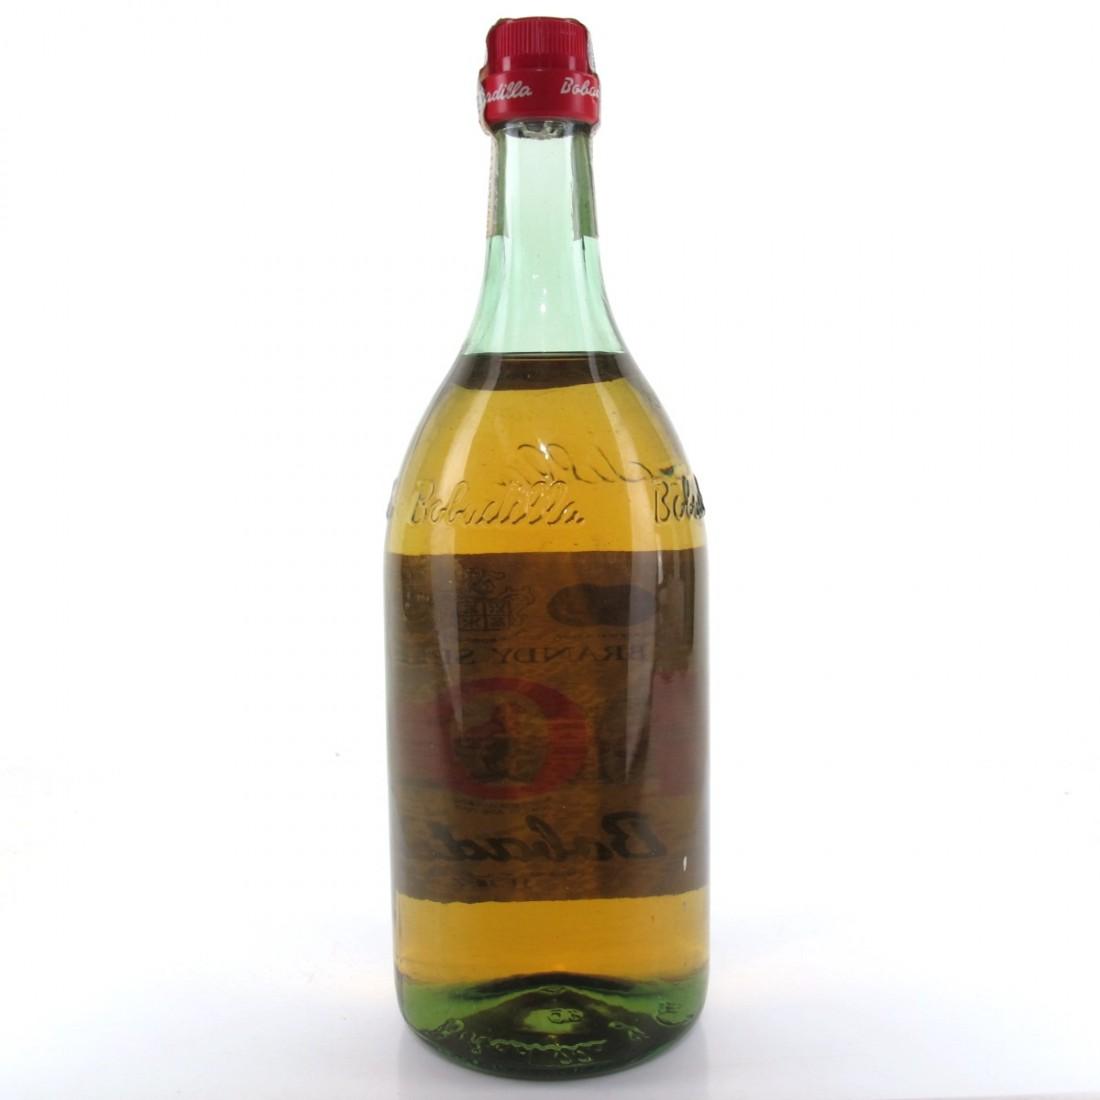 Bobadilla 103 Brandy Selecto 1 Litre 1960/70s